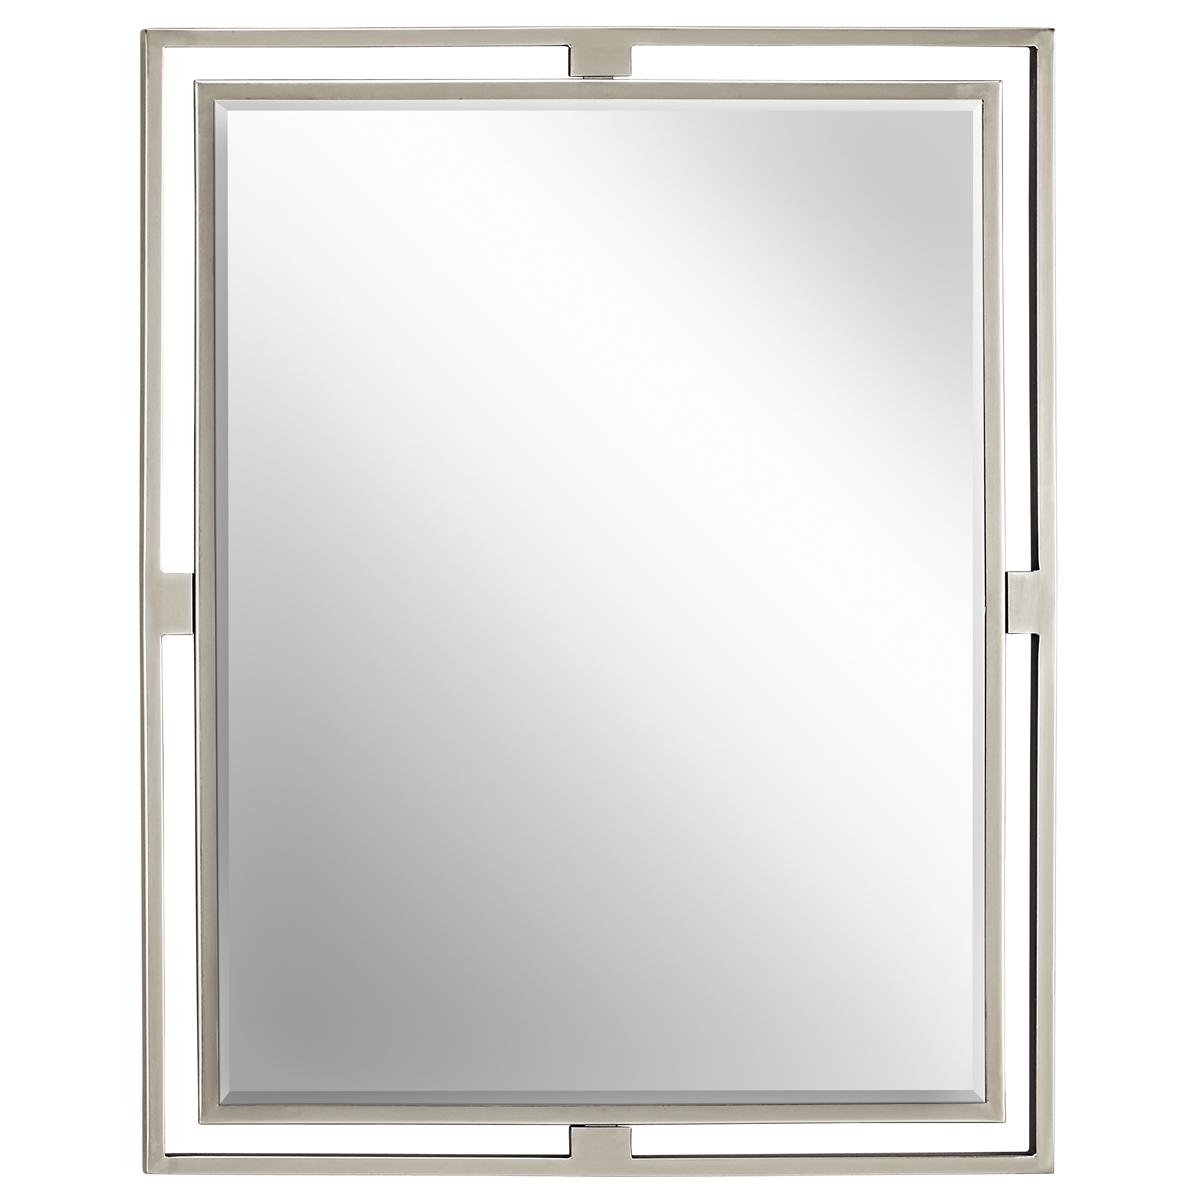 Kichler,41071NI,Mirror